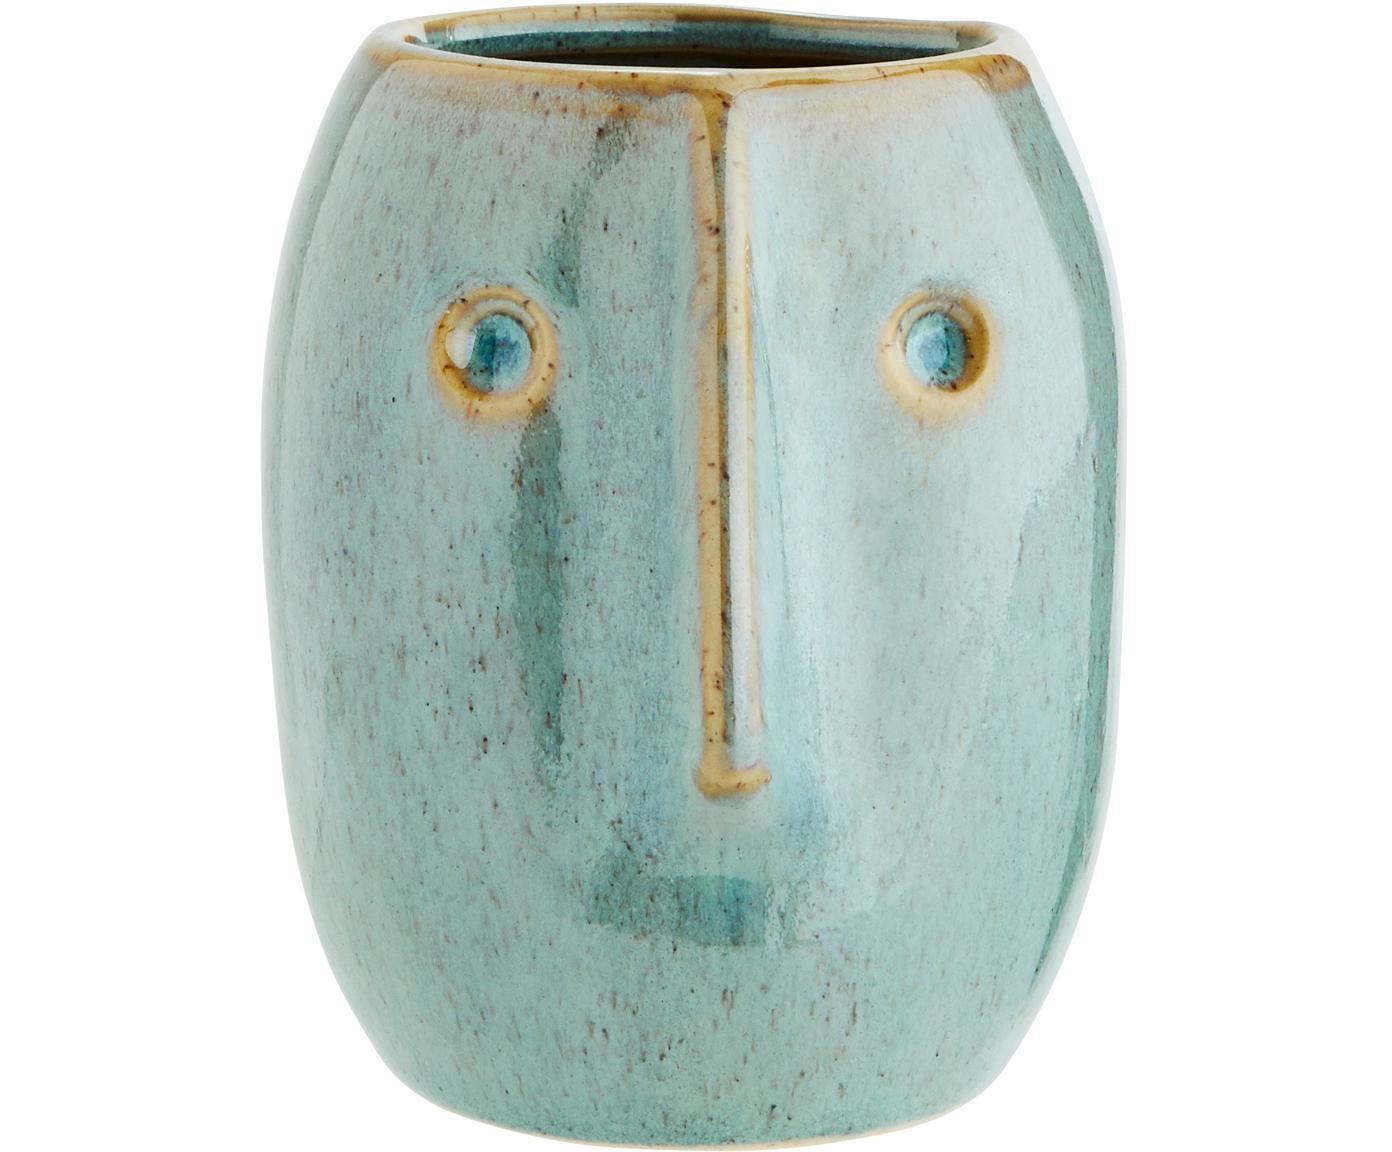 Portavaso Face, Terracotta, Verde chiaro, beige, Ø 8 x Alt. 10 cm